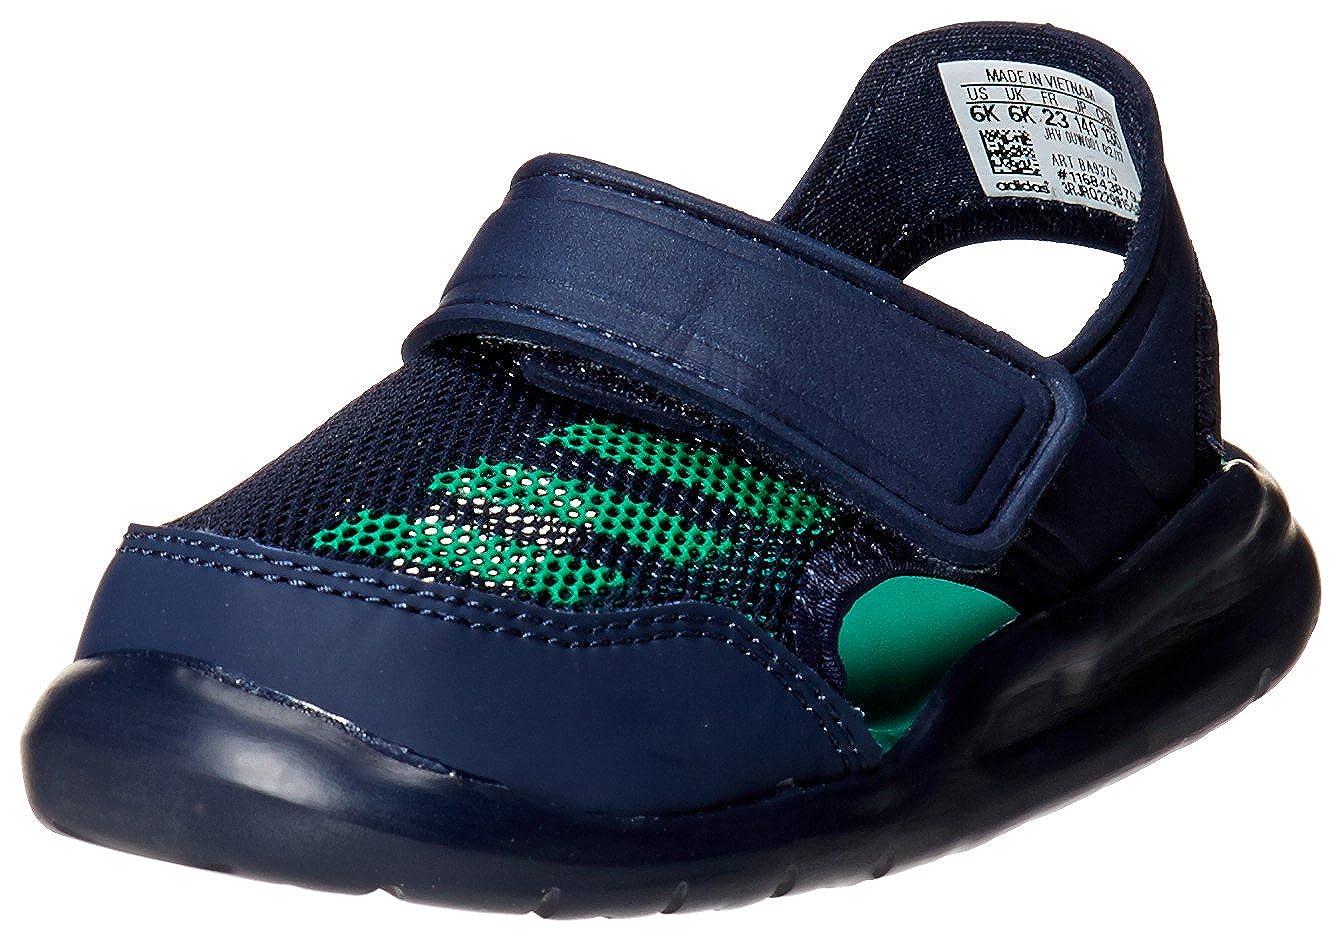 adidas BA9375/BA9380 Forta Swim C Jungen Baby Badeschuh Mesh Klett adidas Performance